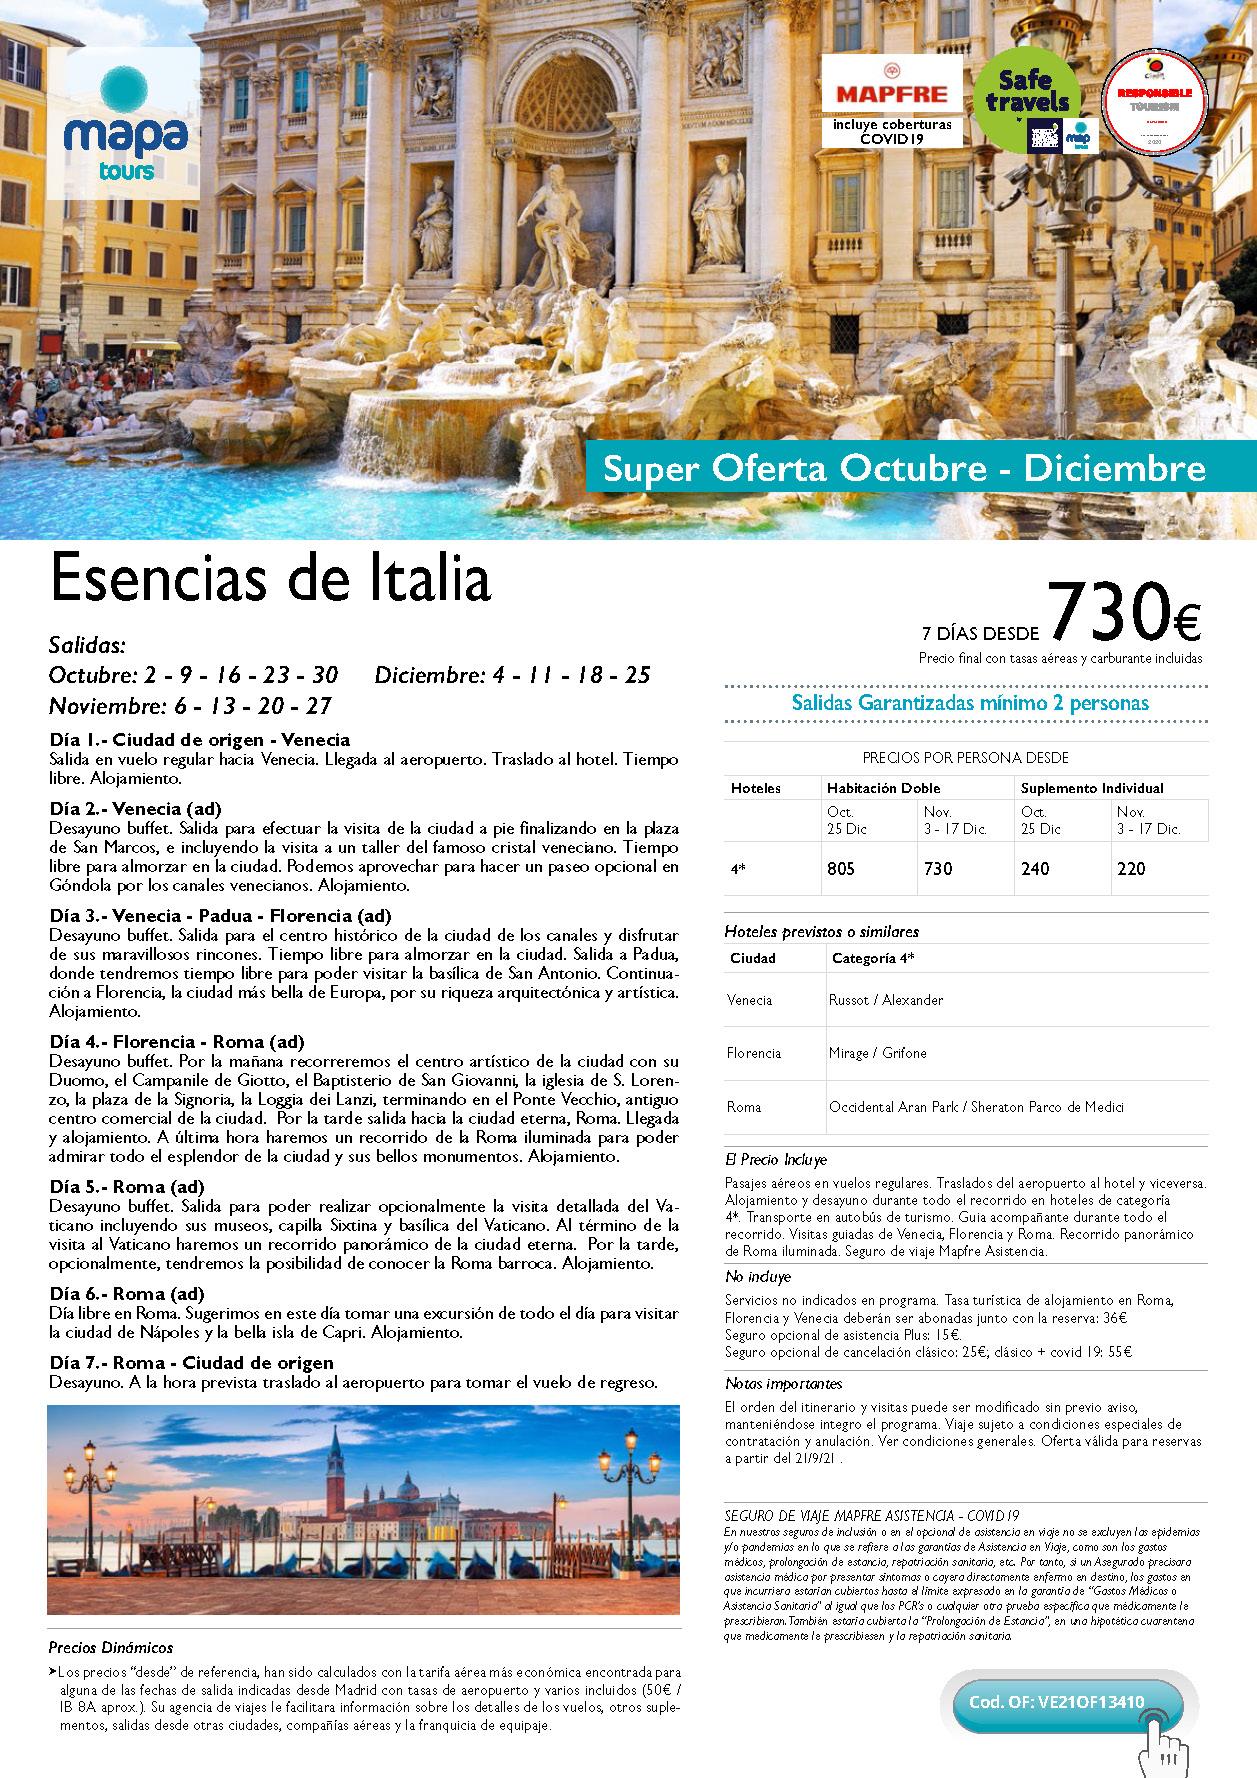 Super Oferta Mapa Tours Octubre a Diciembre 2021 Esencias de Italia salidas desde Madrid